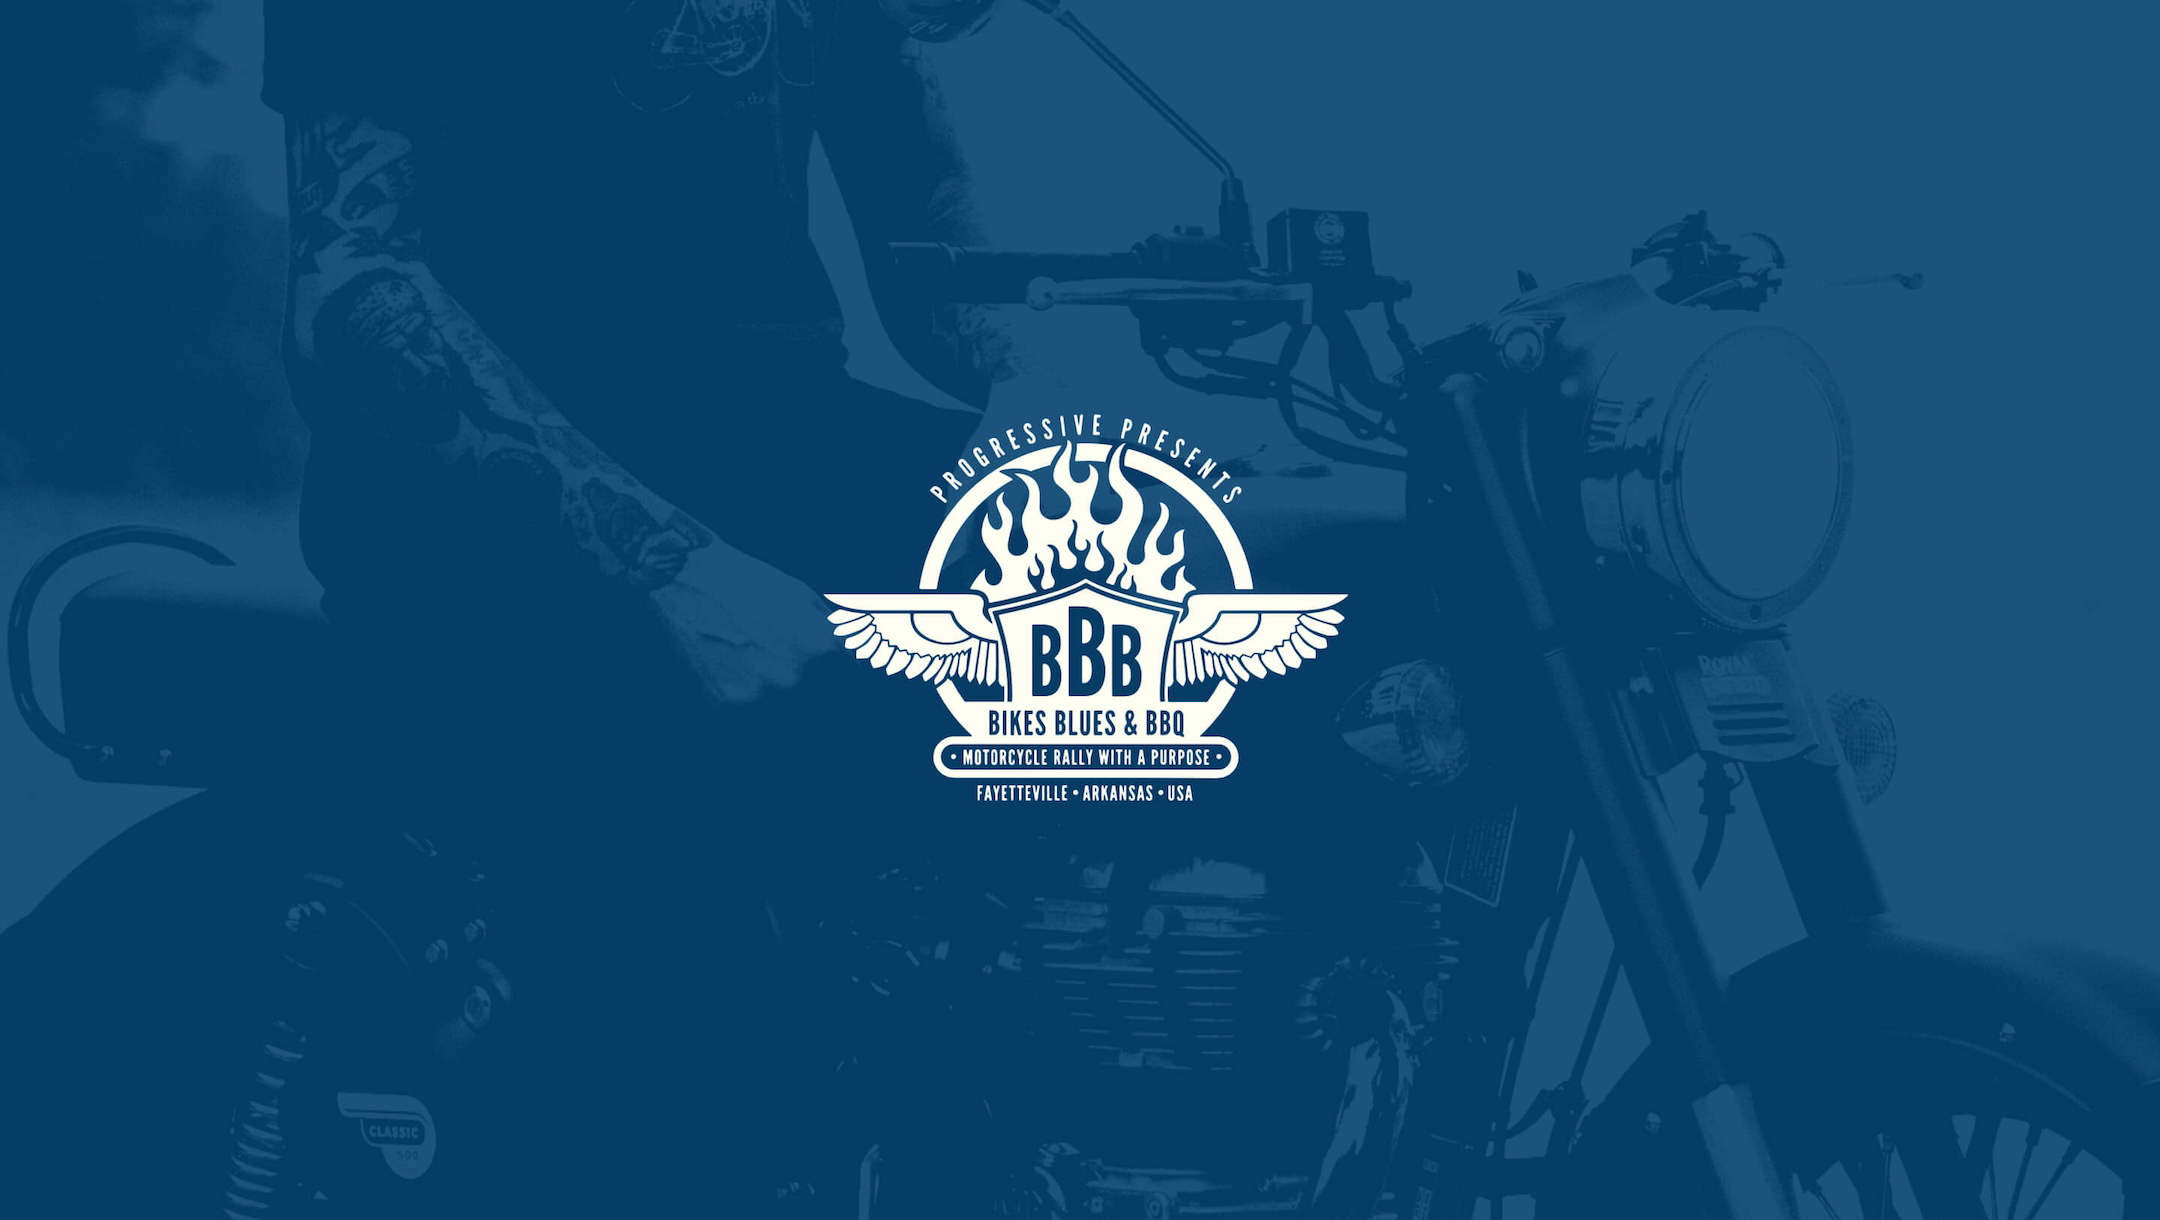 bikes blues bbq logo with photo background